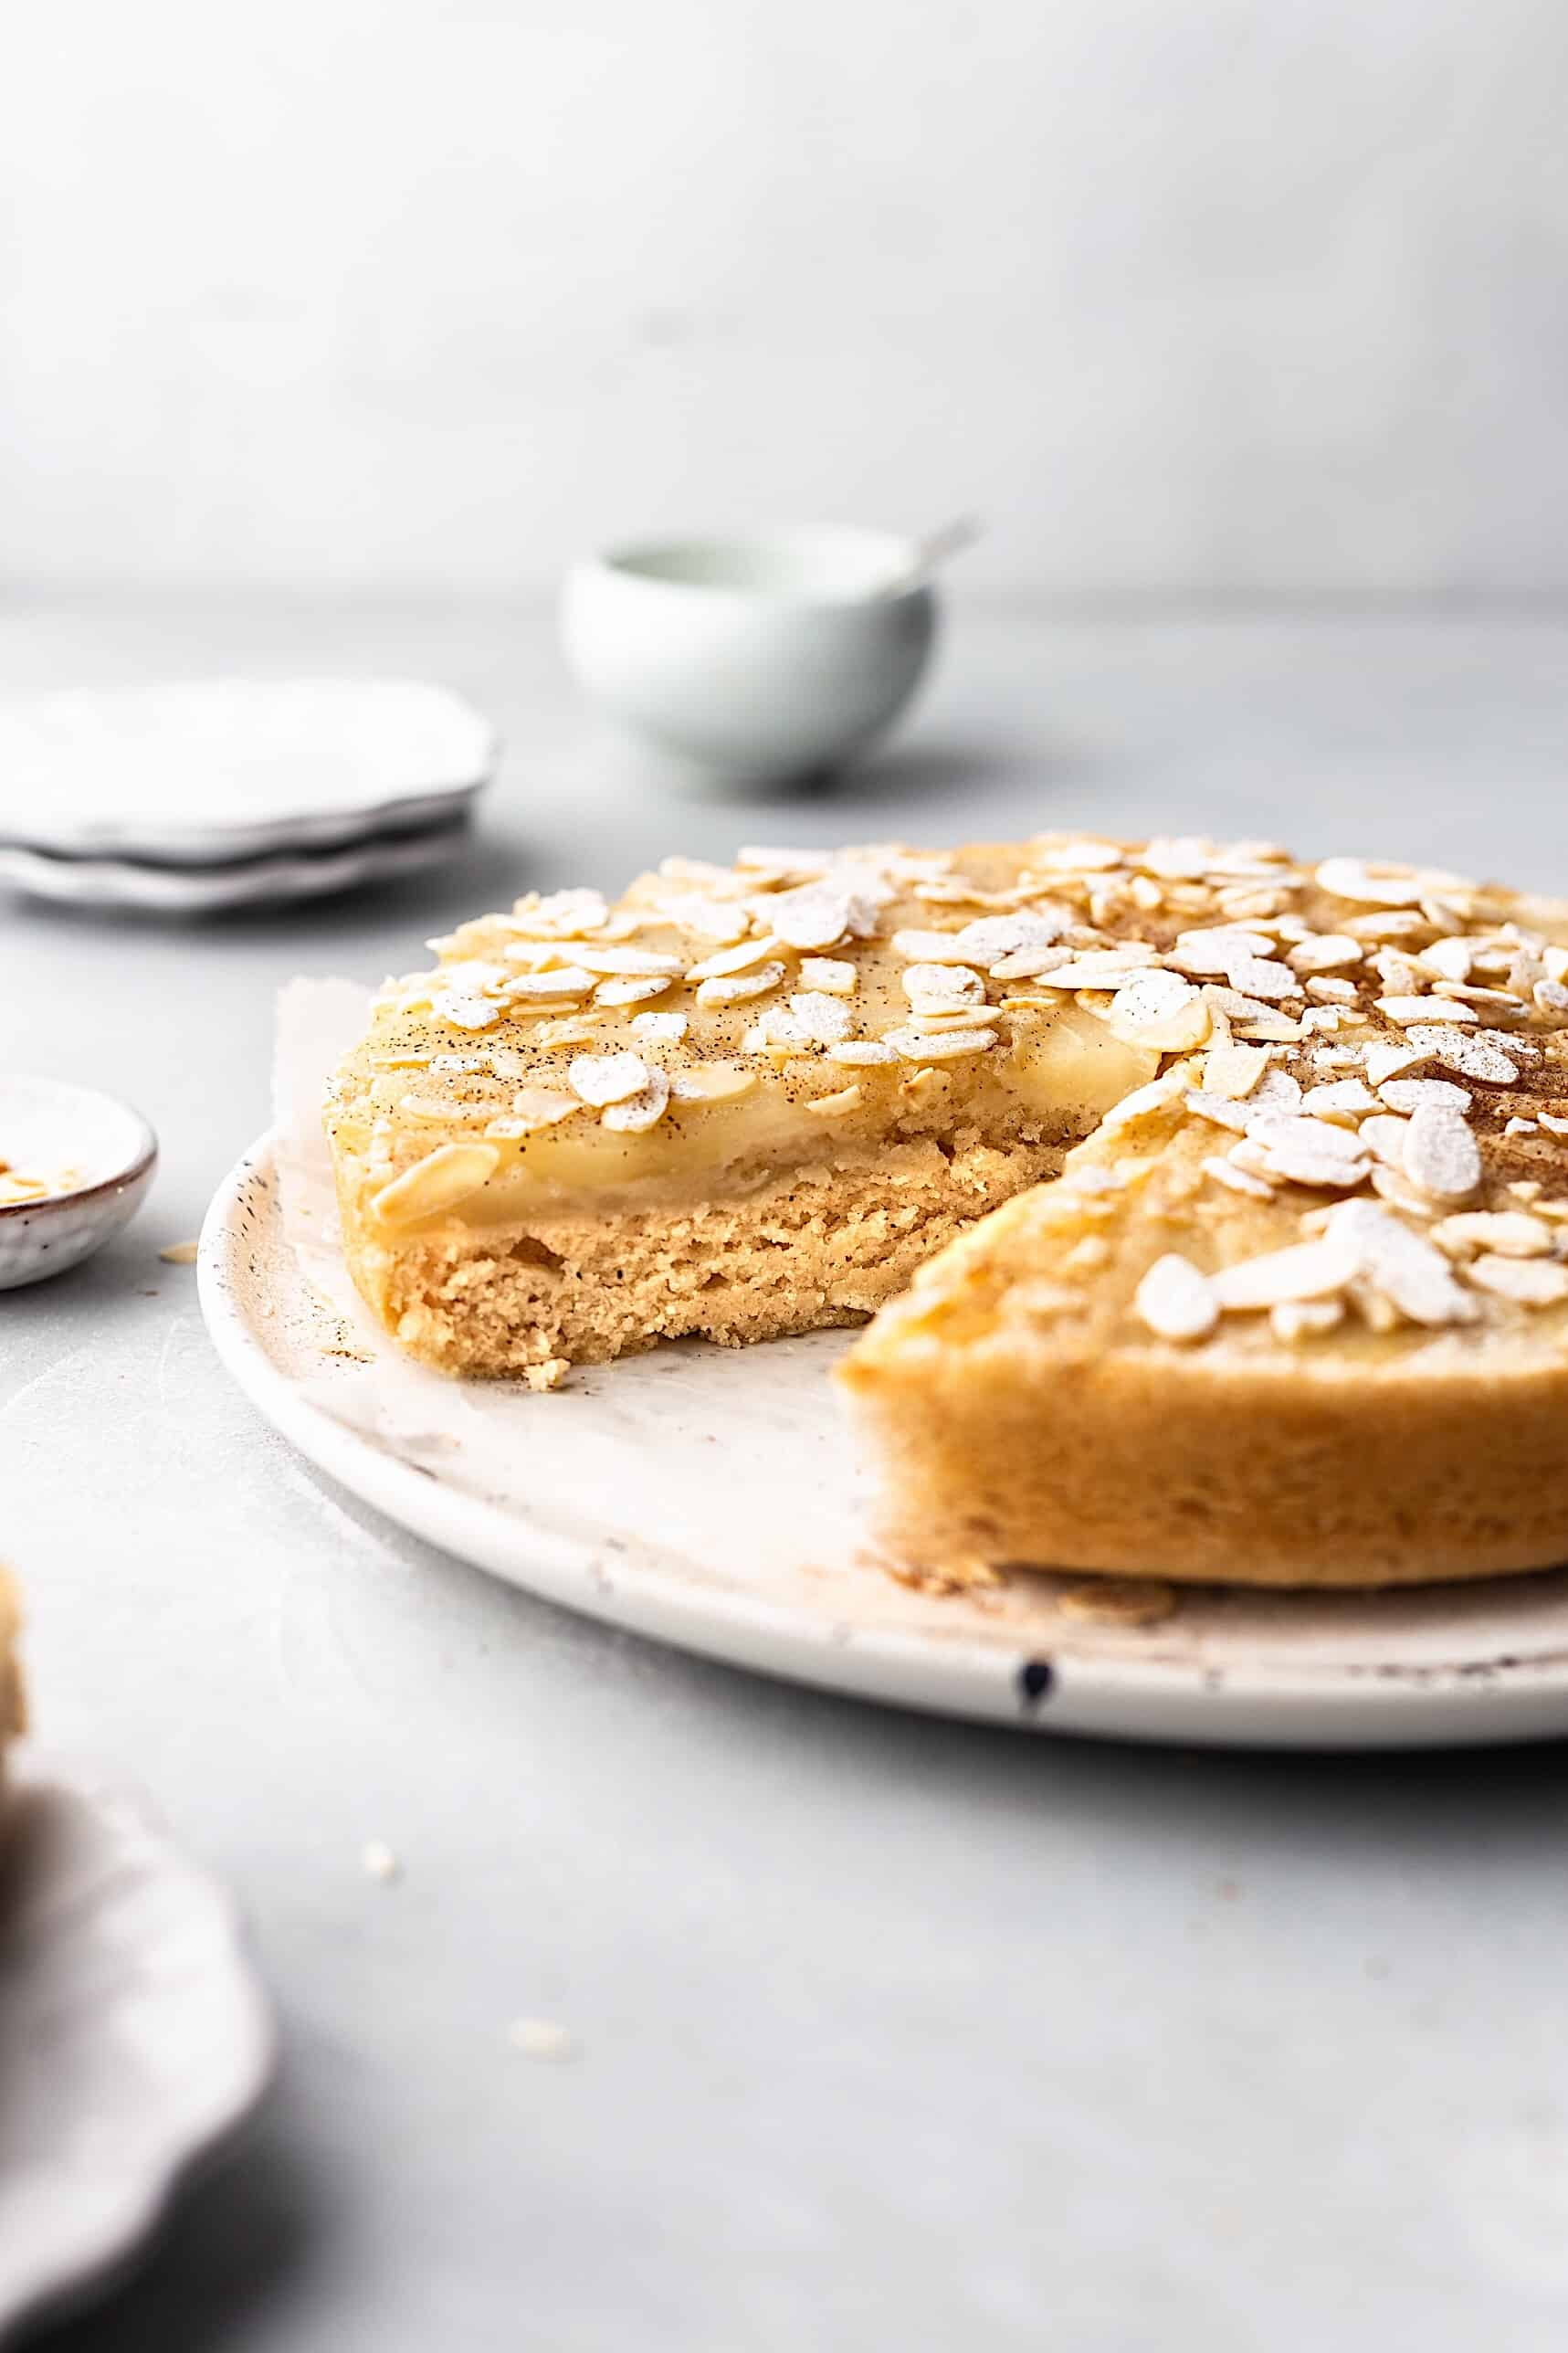 Vegan Upside Down Pear Almond Cake #cake #recipe #vegan